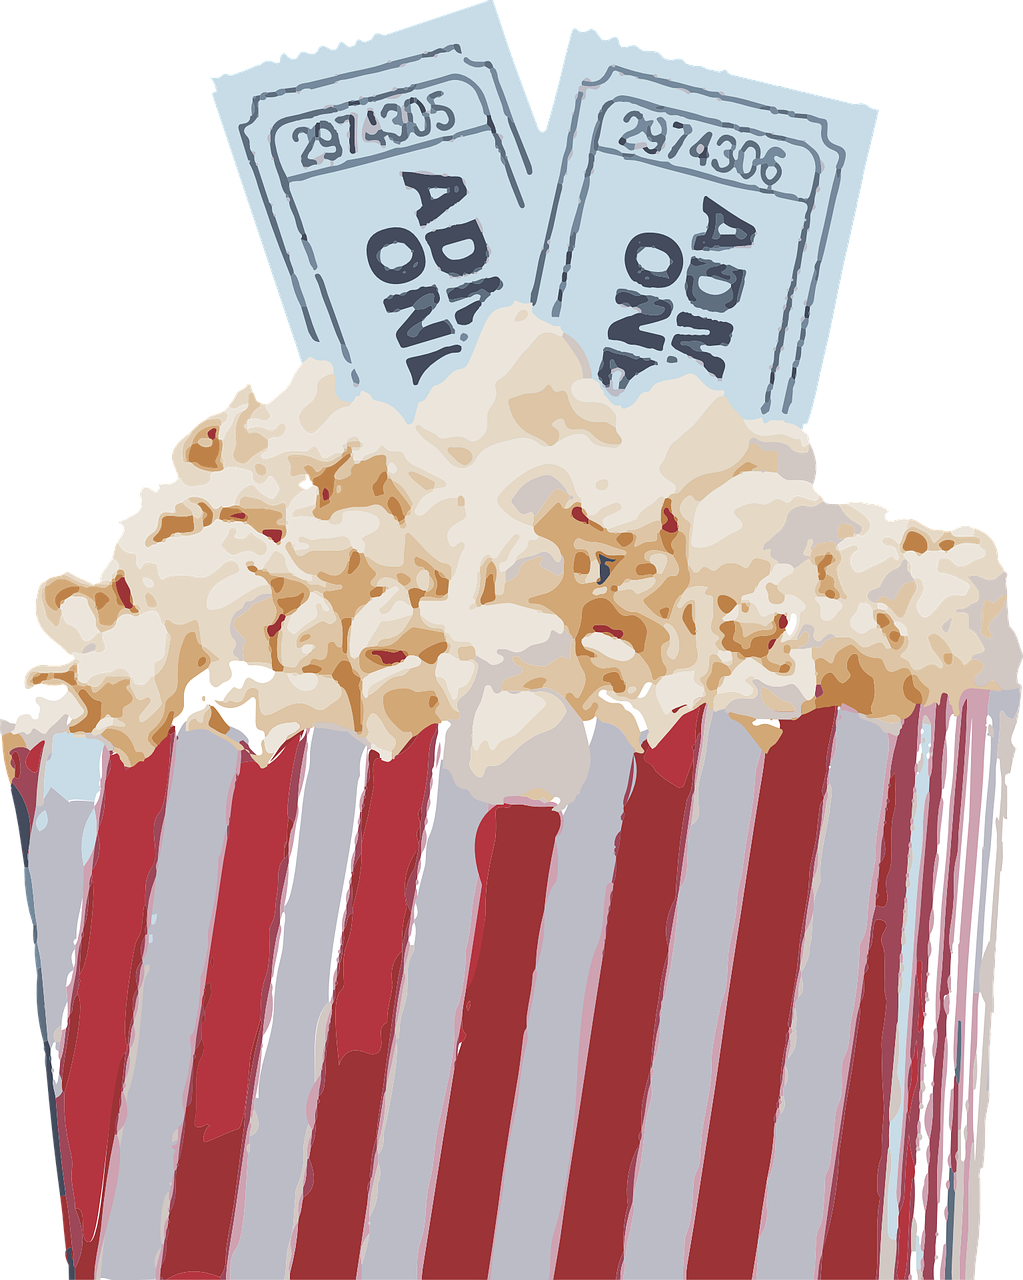 Movie Popcorn from Pixelbay